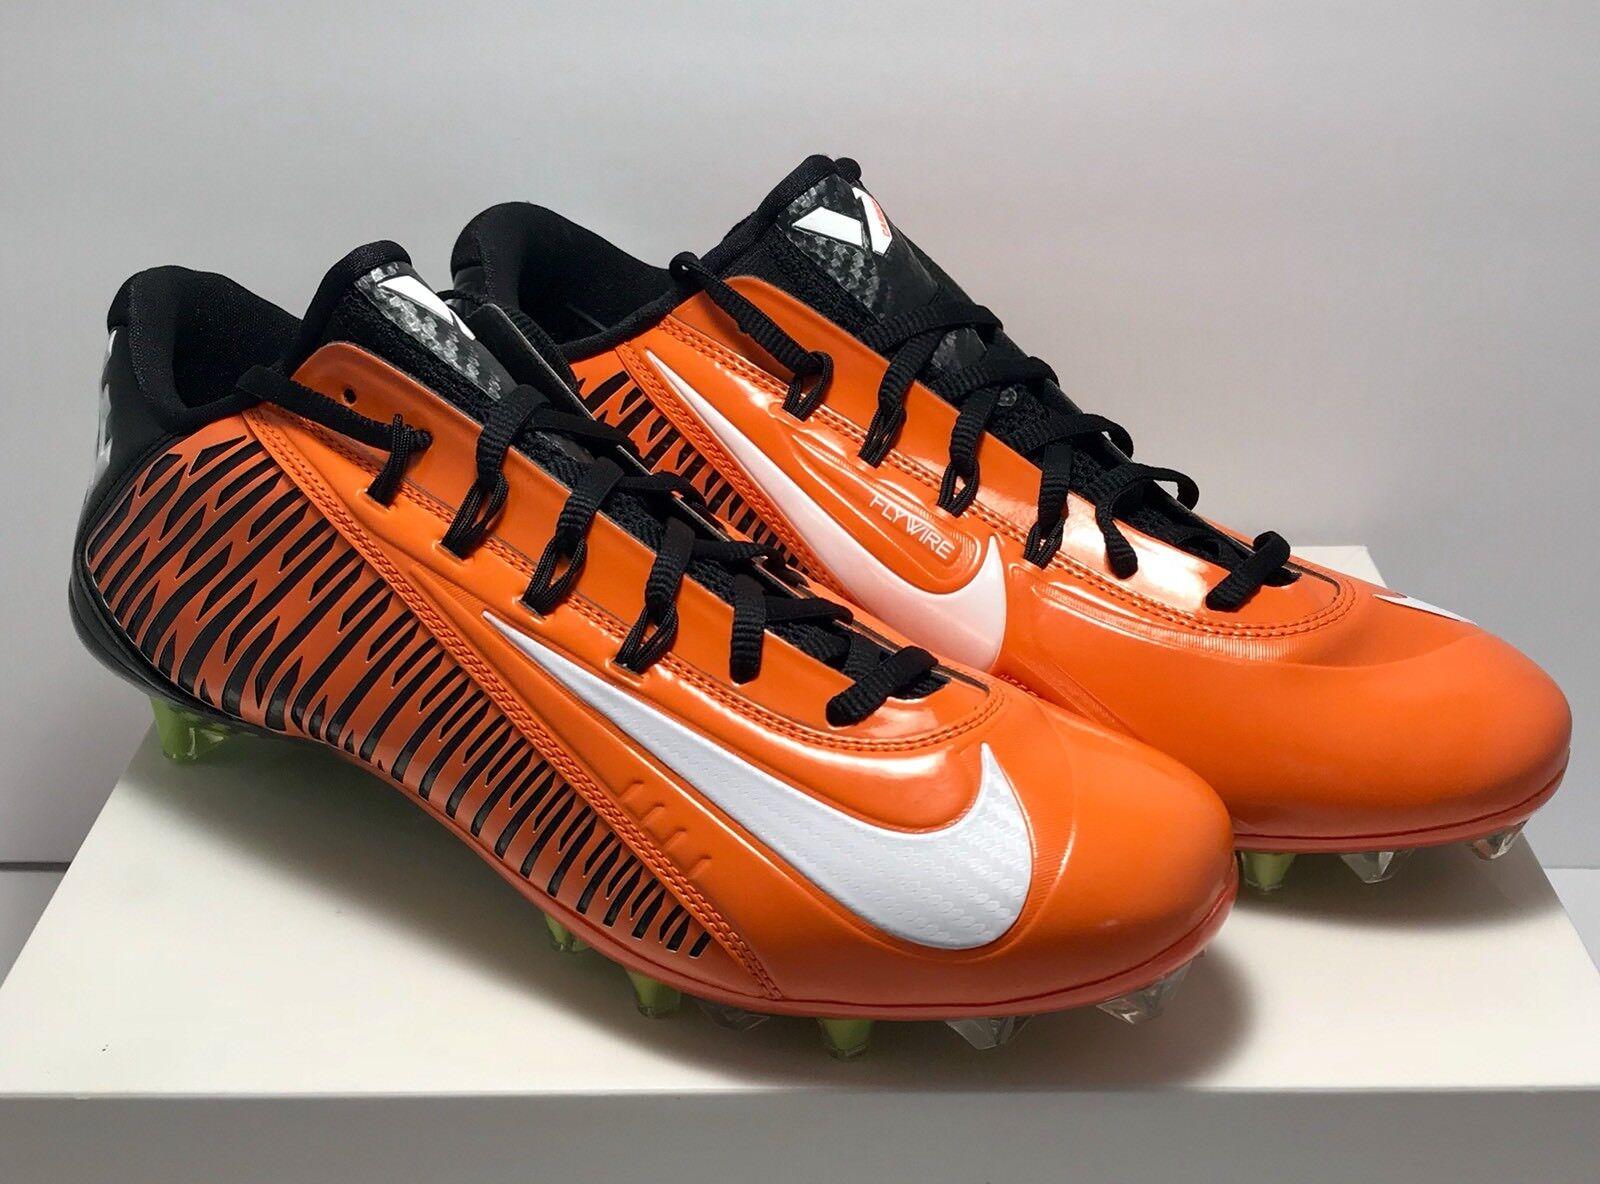 Nike uomini elite 2 flywire carbonio 14 vapore calcio calcio arancione nero